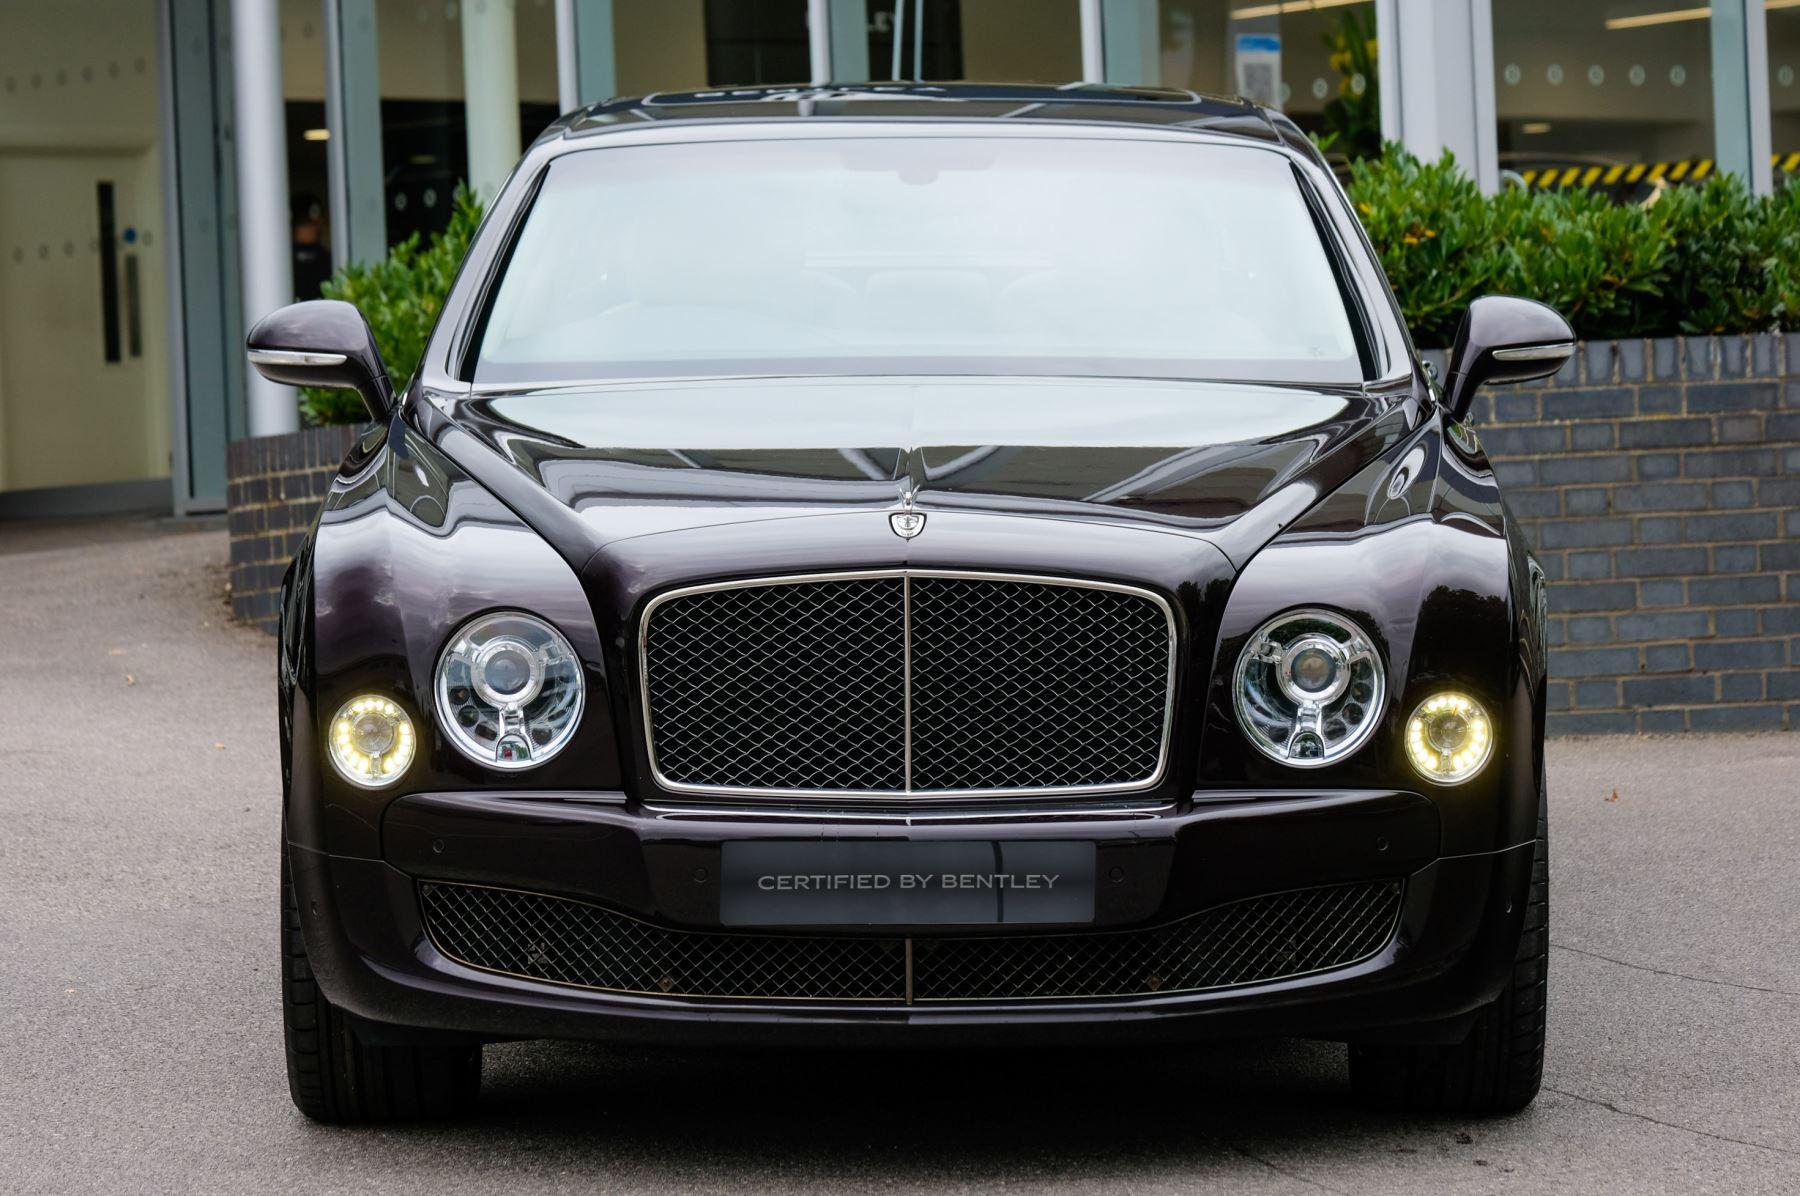 Bentley Mulsanne 6.8 V8 Speed - Speed Premier Specification image 2